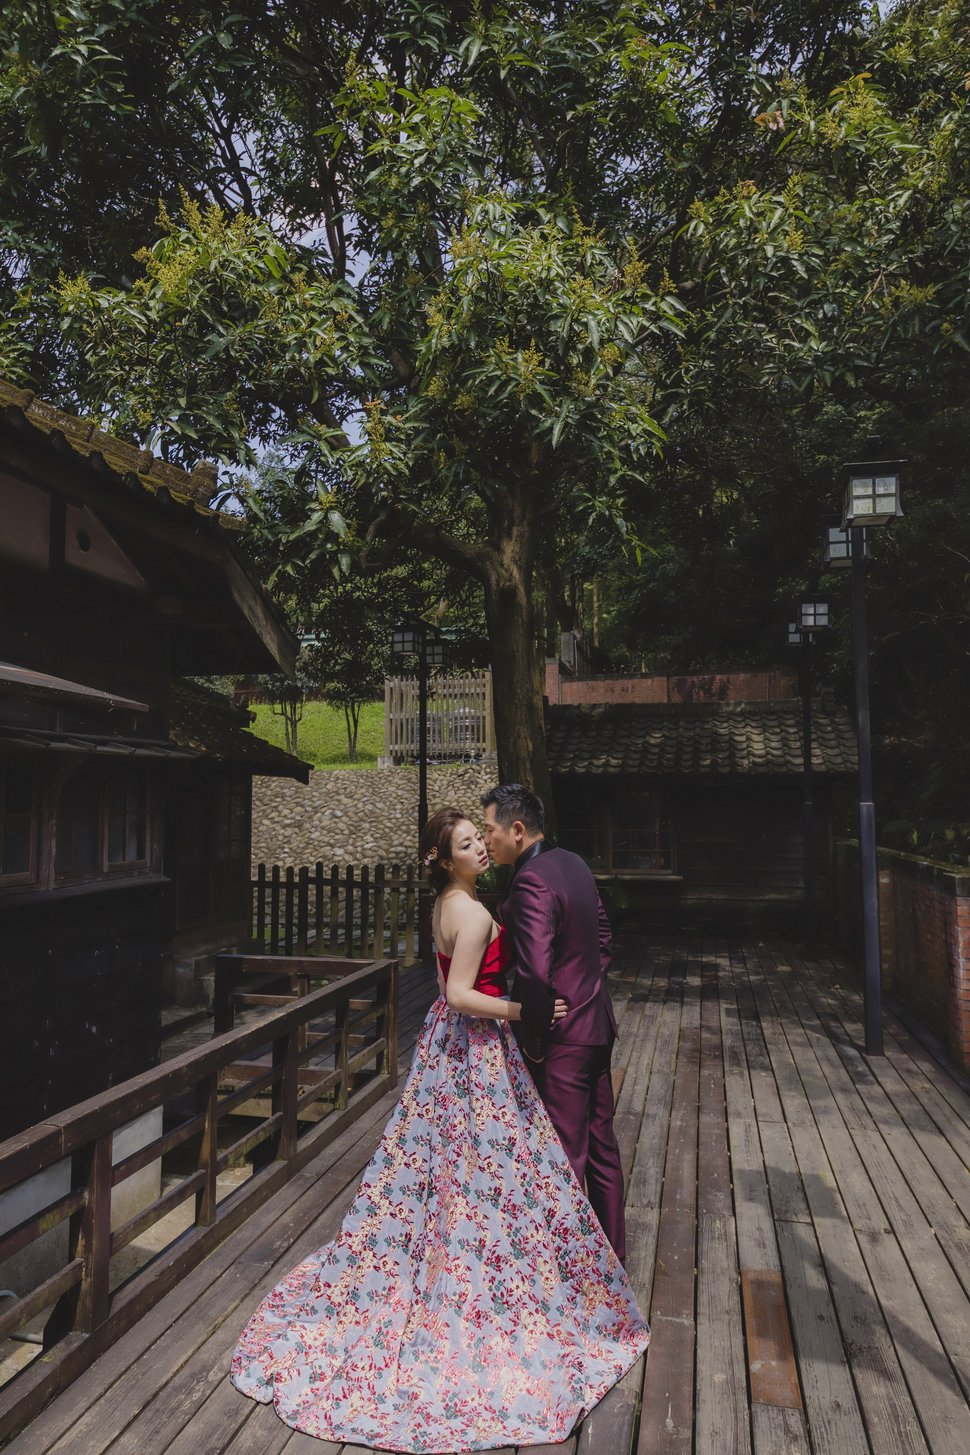 Khalil Chou(經典復古)-27 - 凱勒・周 獨立影像《結婚吧》